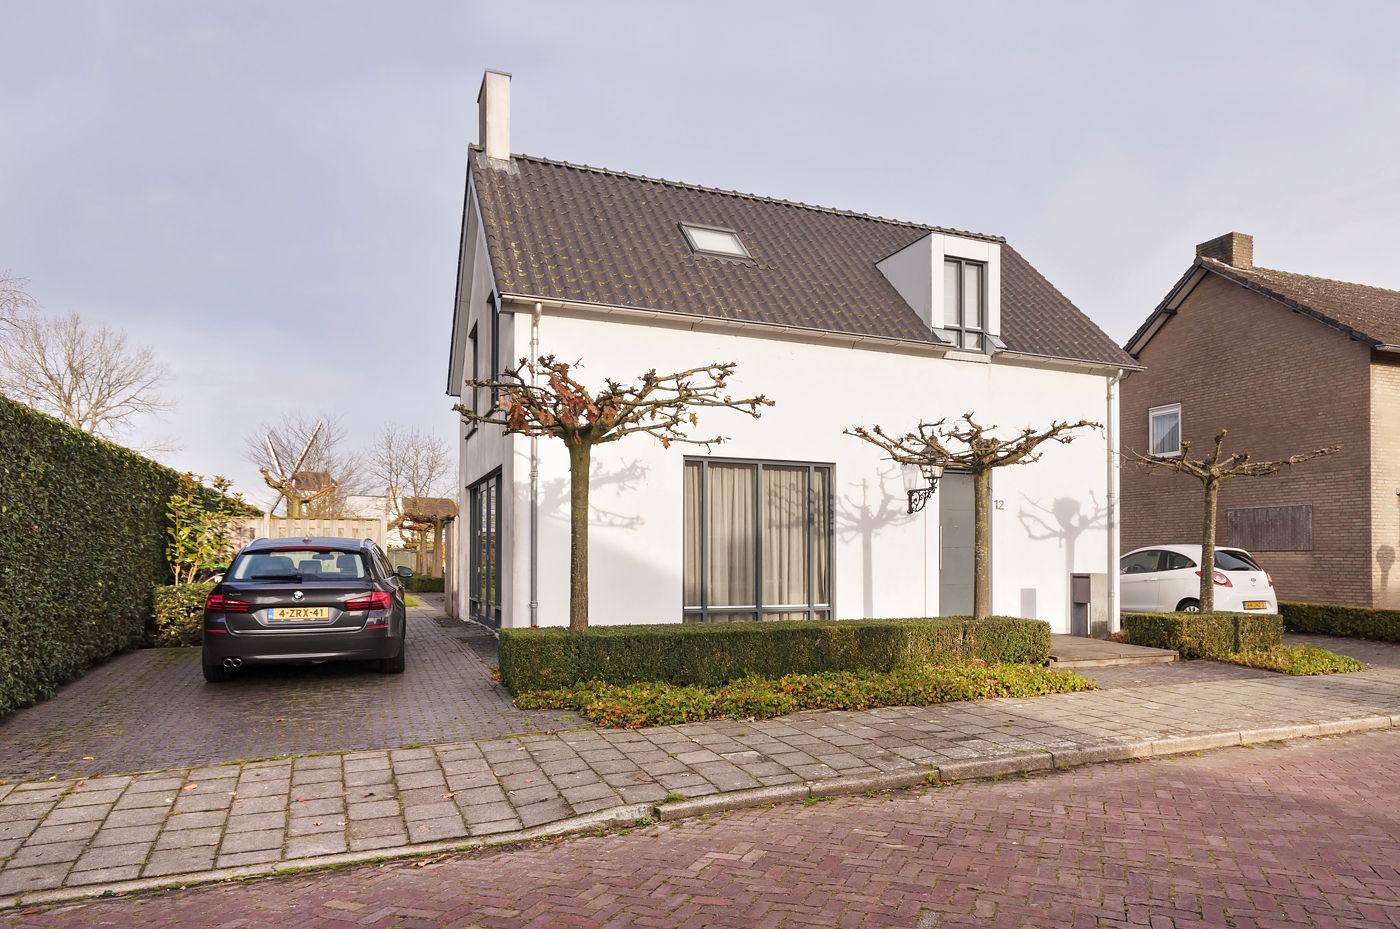 Woonhuis – Hooihofstraat 12, Uden - Essermakelaardij